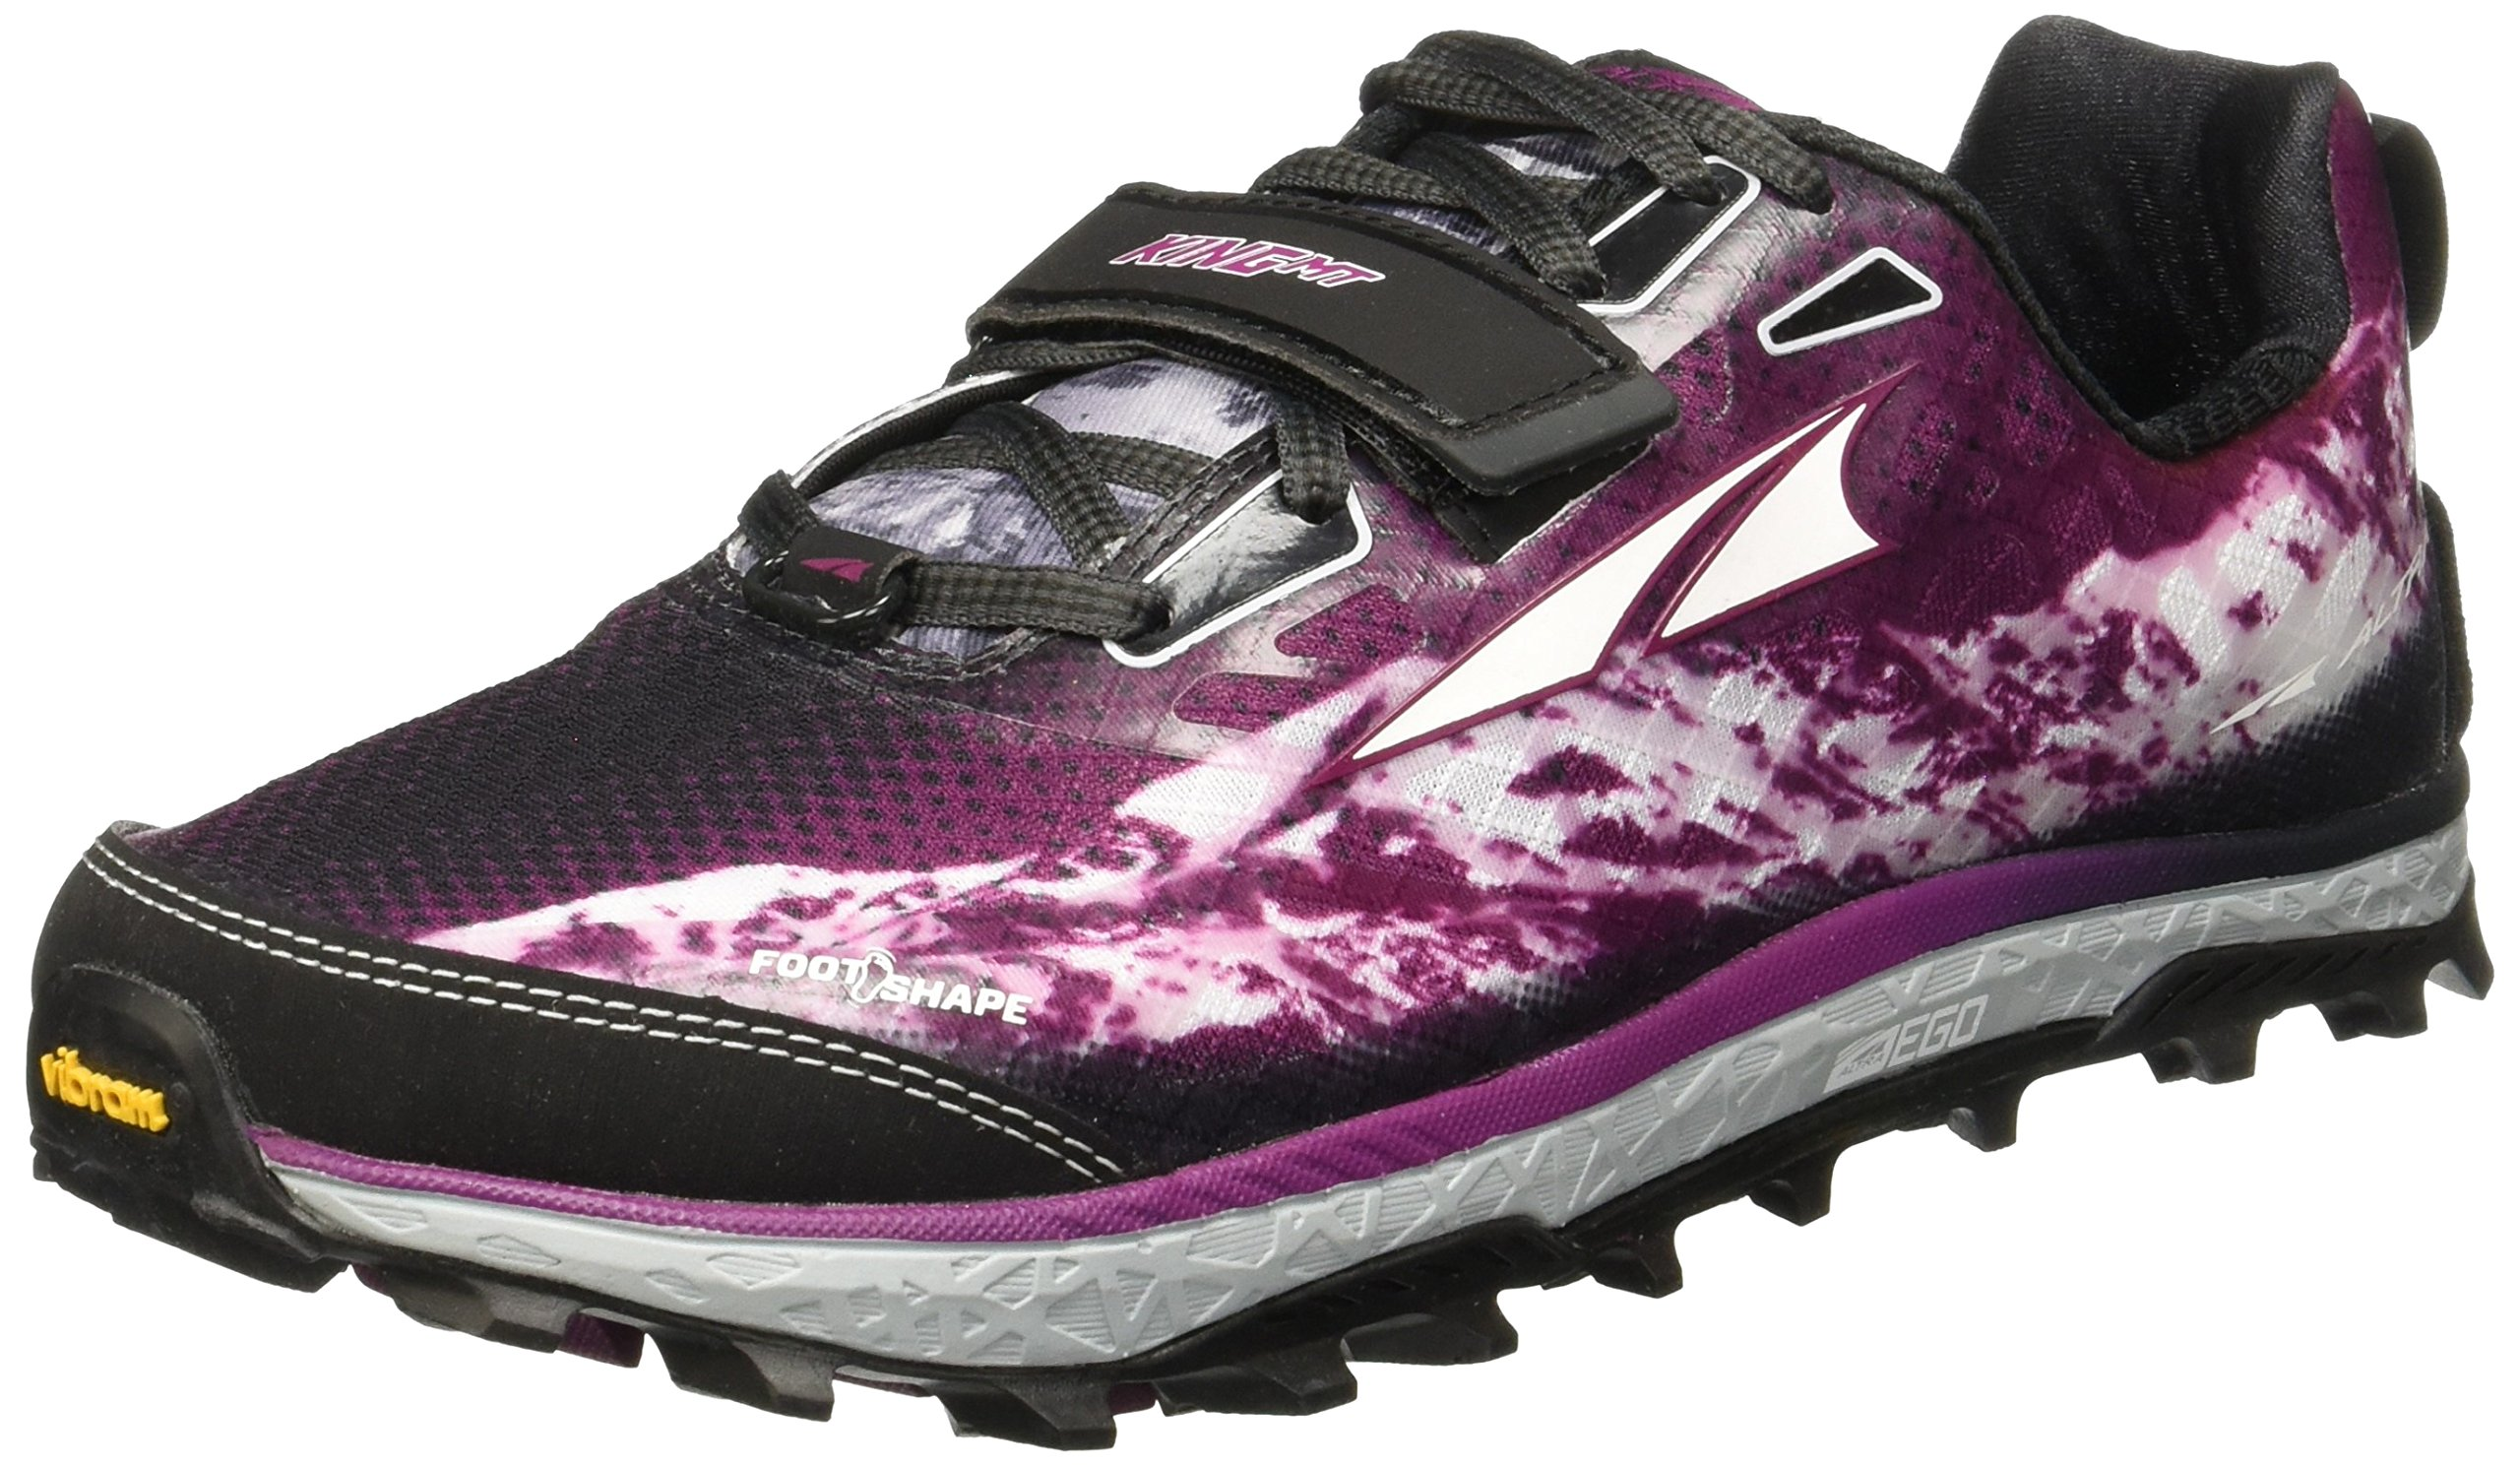 Altra King MT Trail Running Shoe - Womens Gray/Magenta 7